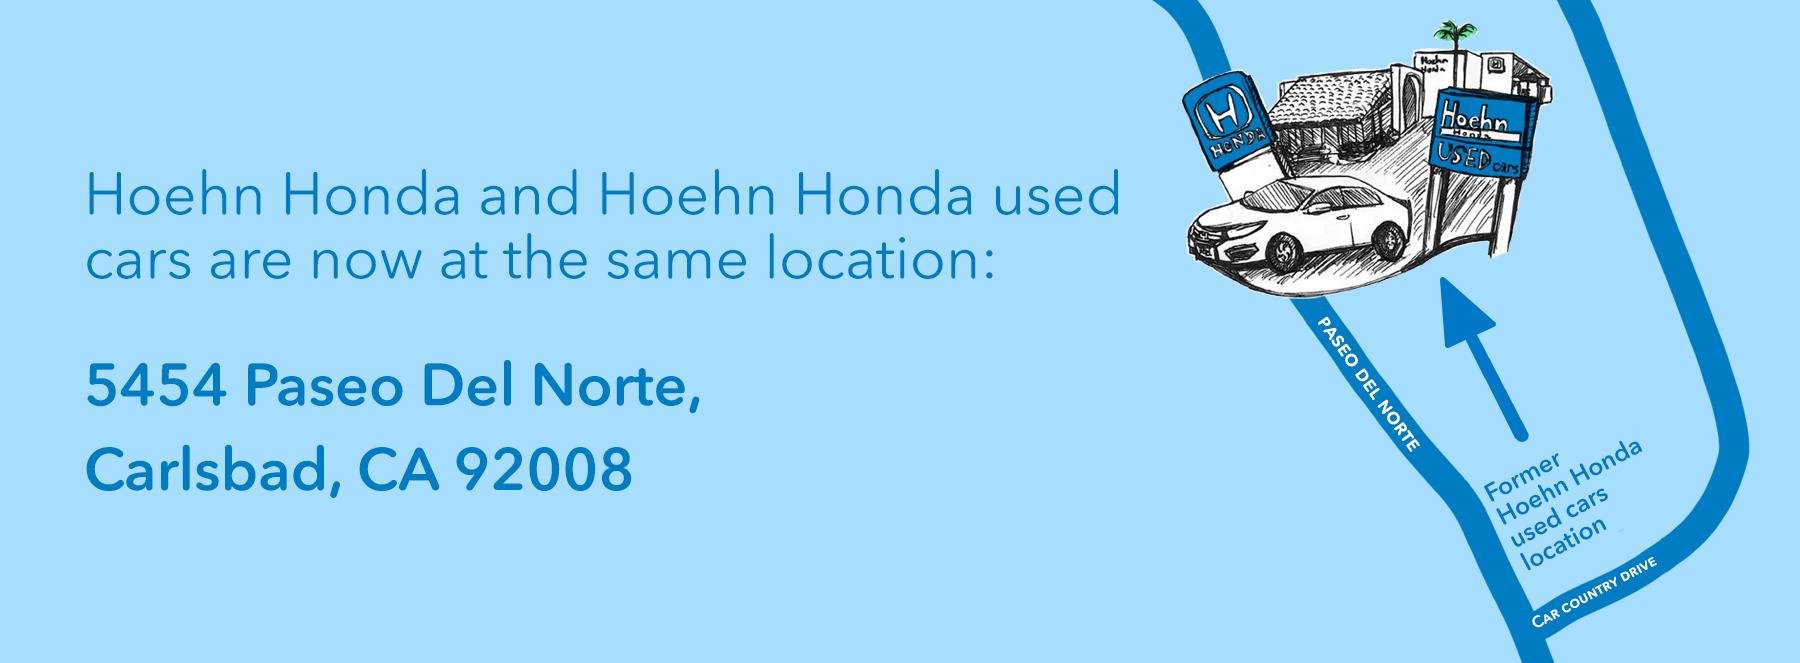 Used car location change